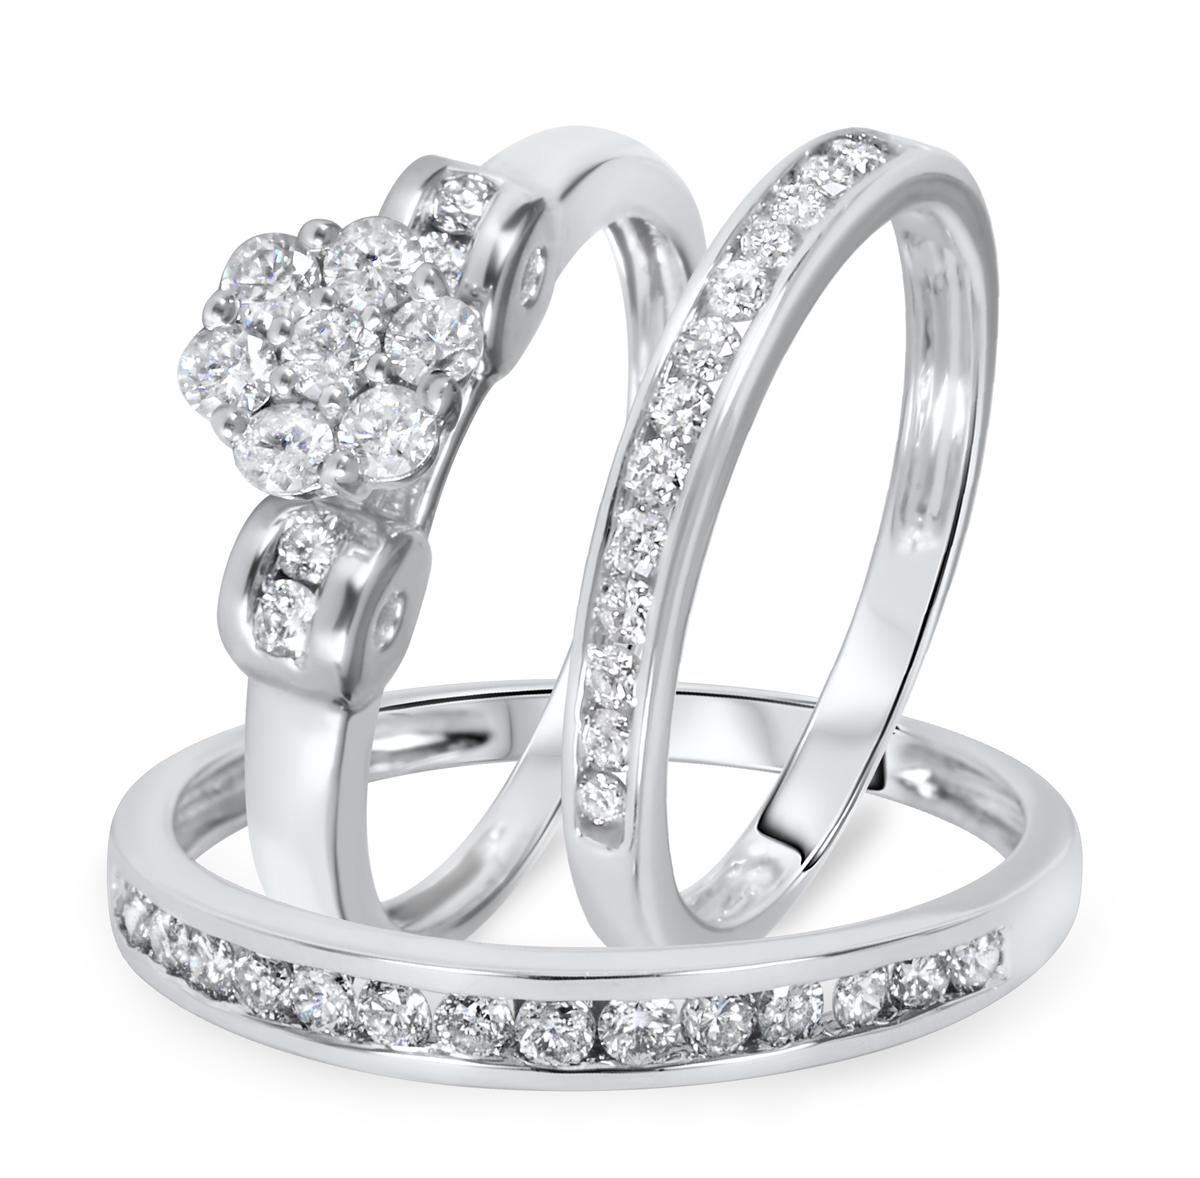 1 1/10 CT. T.W. Diamond Ladies Engagement Ring, Wedding Band, Men's Wedding Band